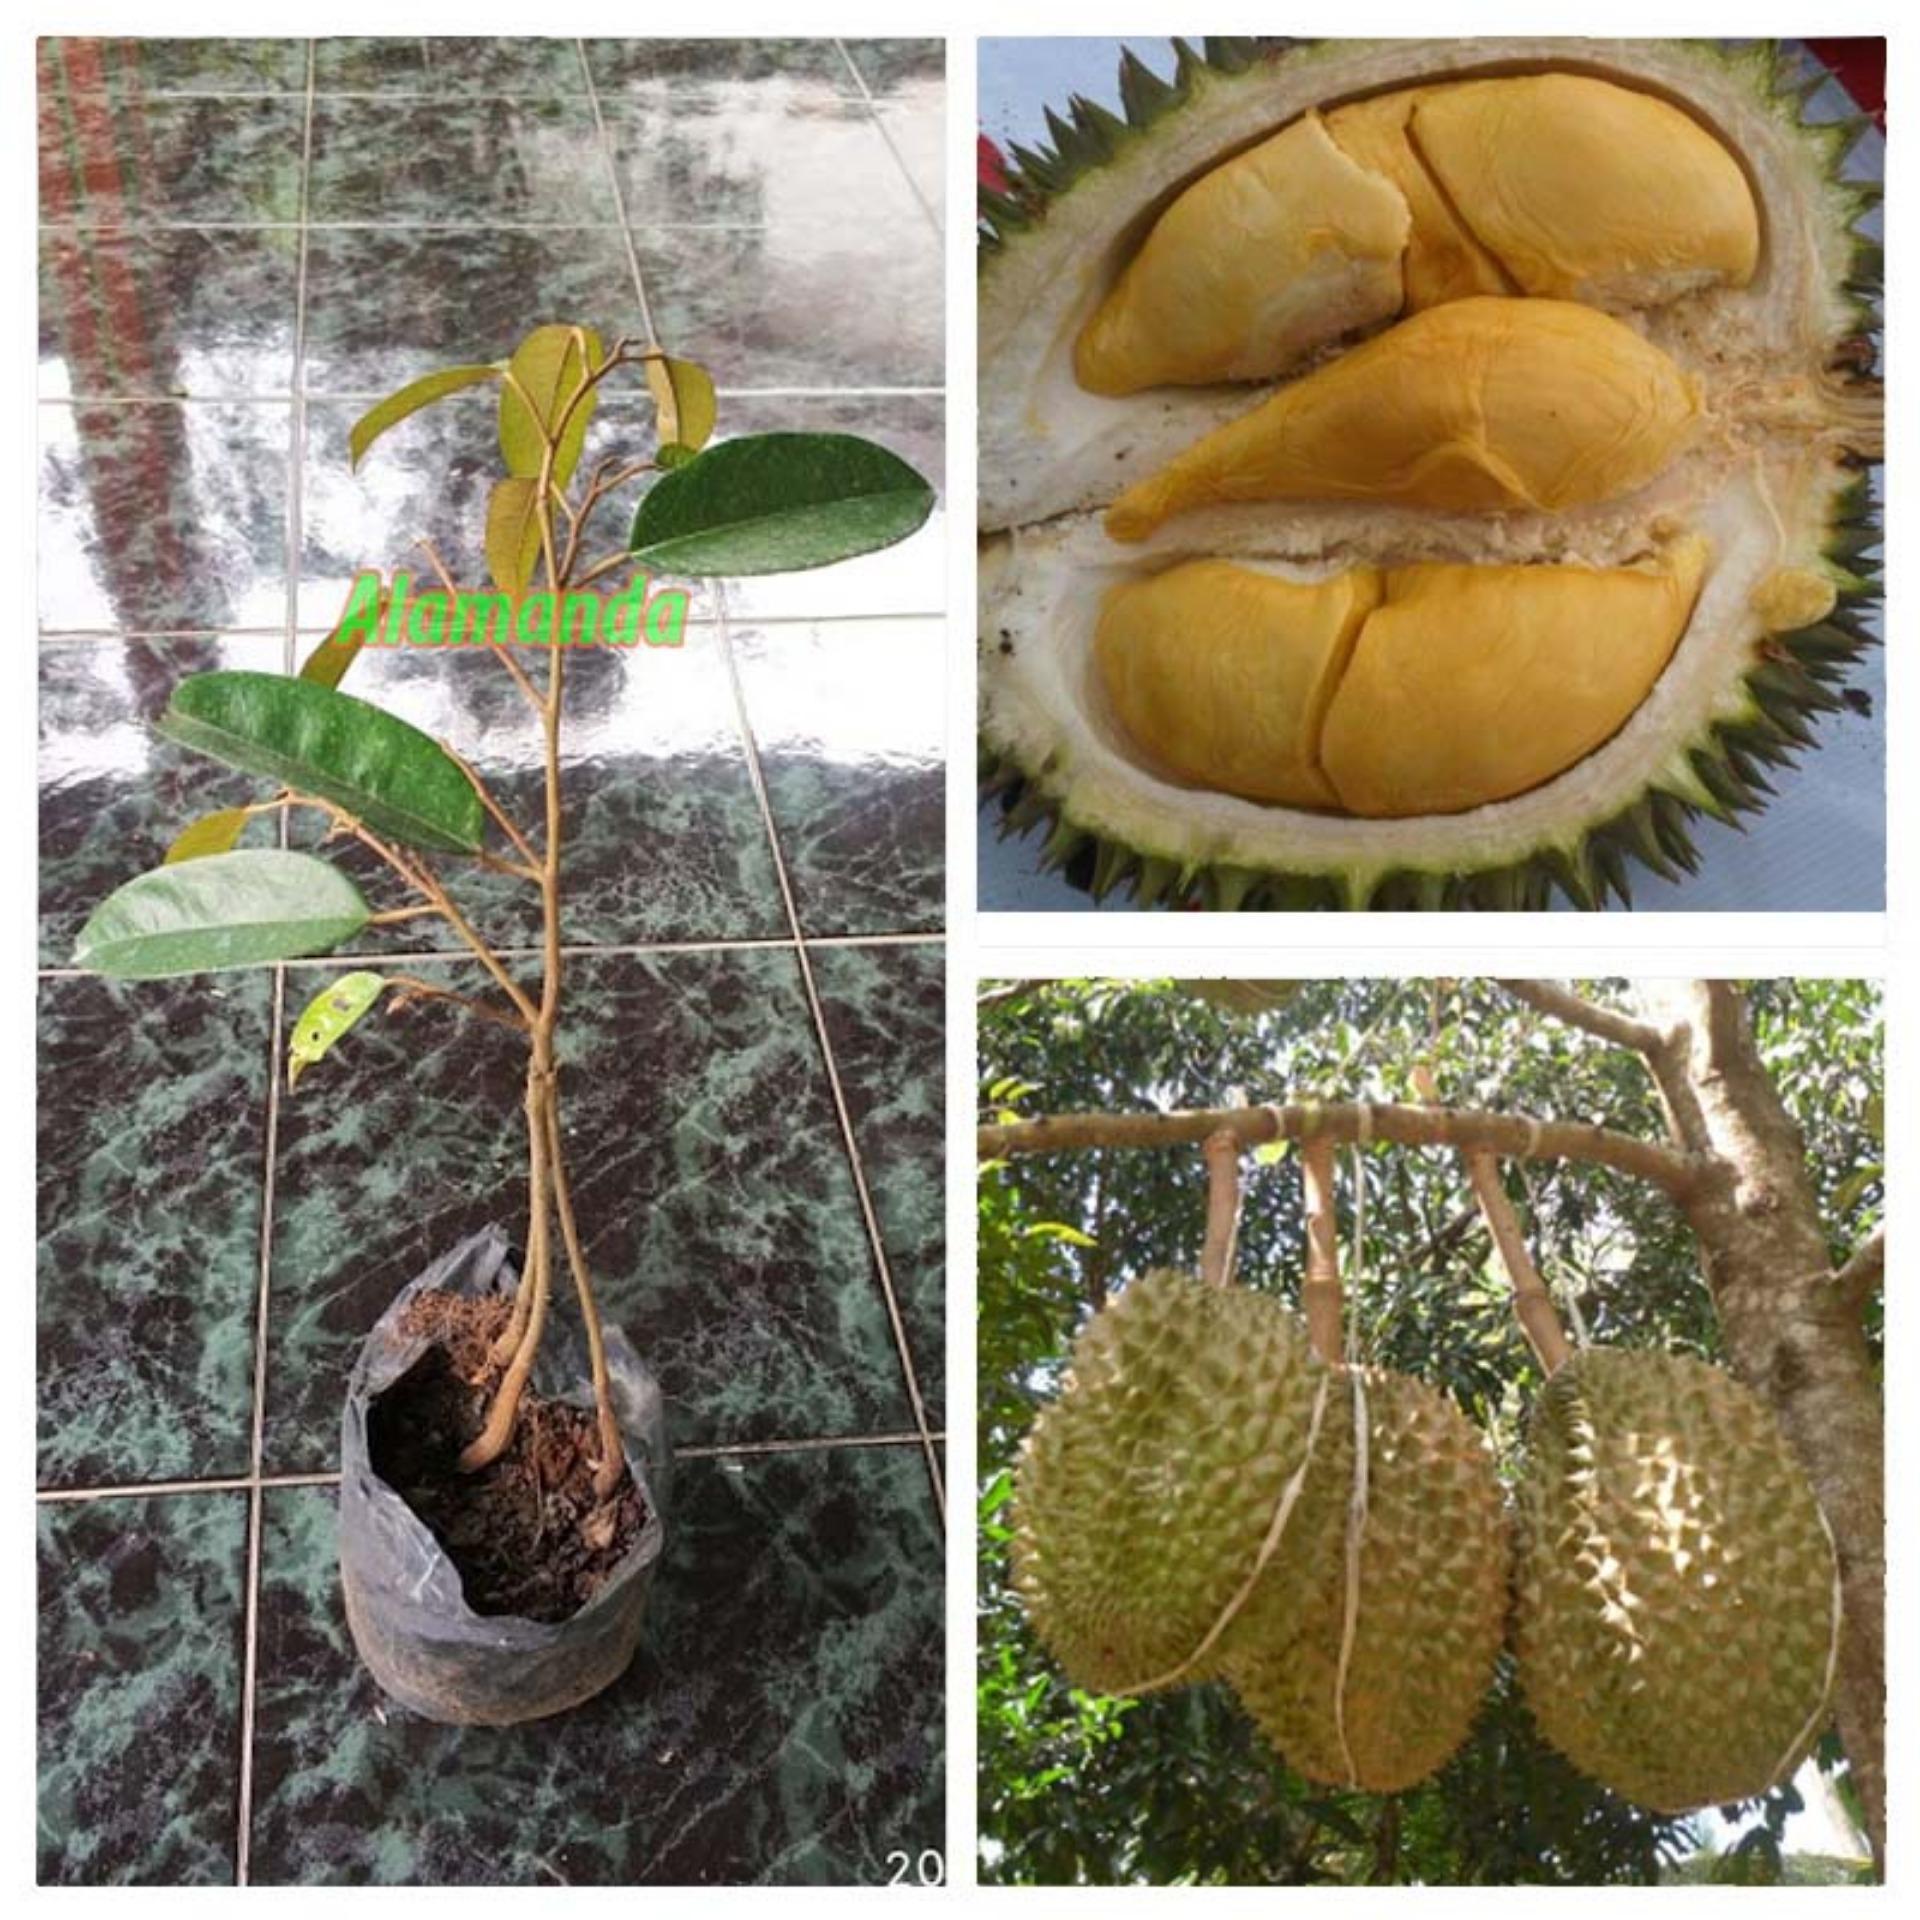 Bibit Tanaman Durian Bawor 3 Kaki